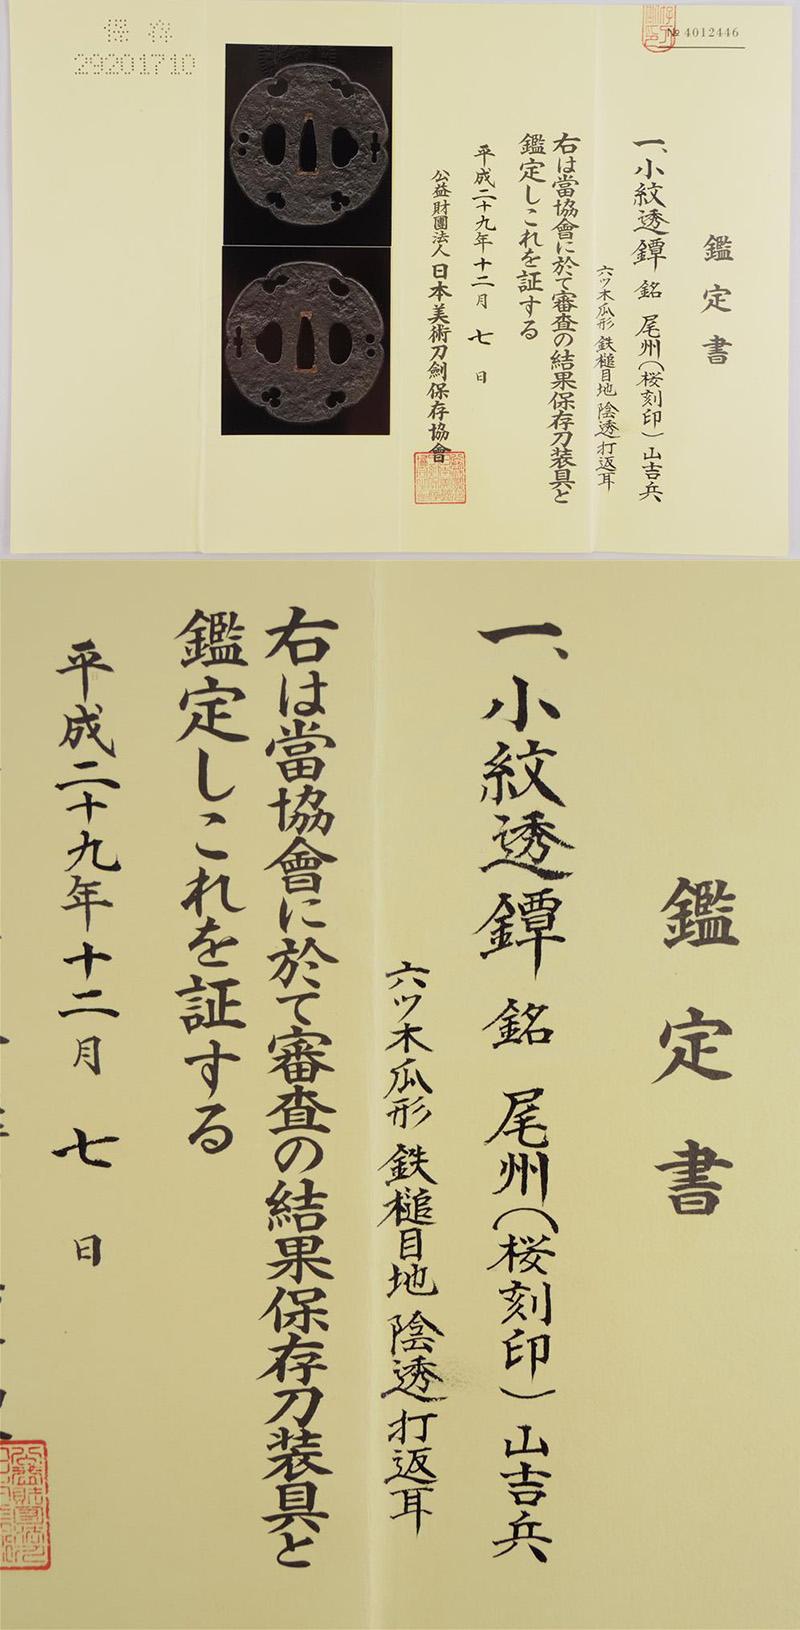 小紋透鍔 尾州(桜刻印)山吉兵 Picture of Certificate